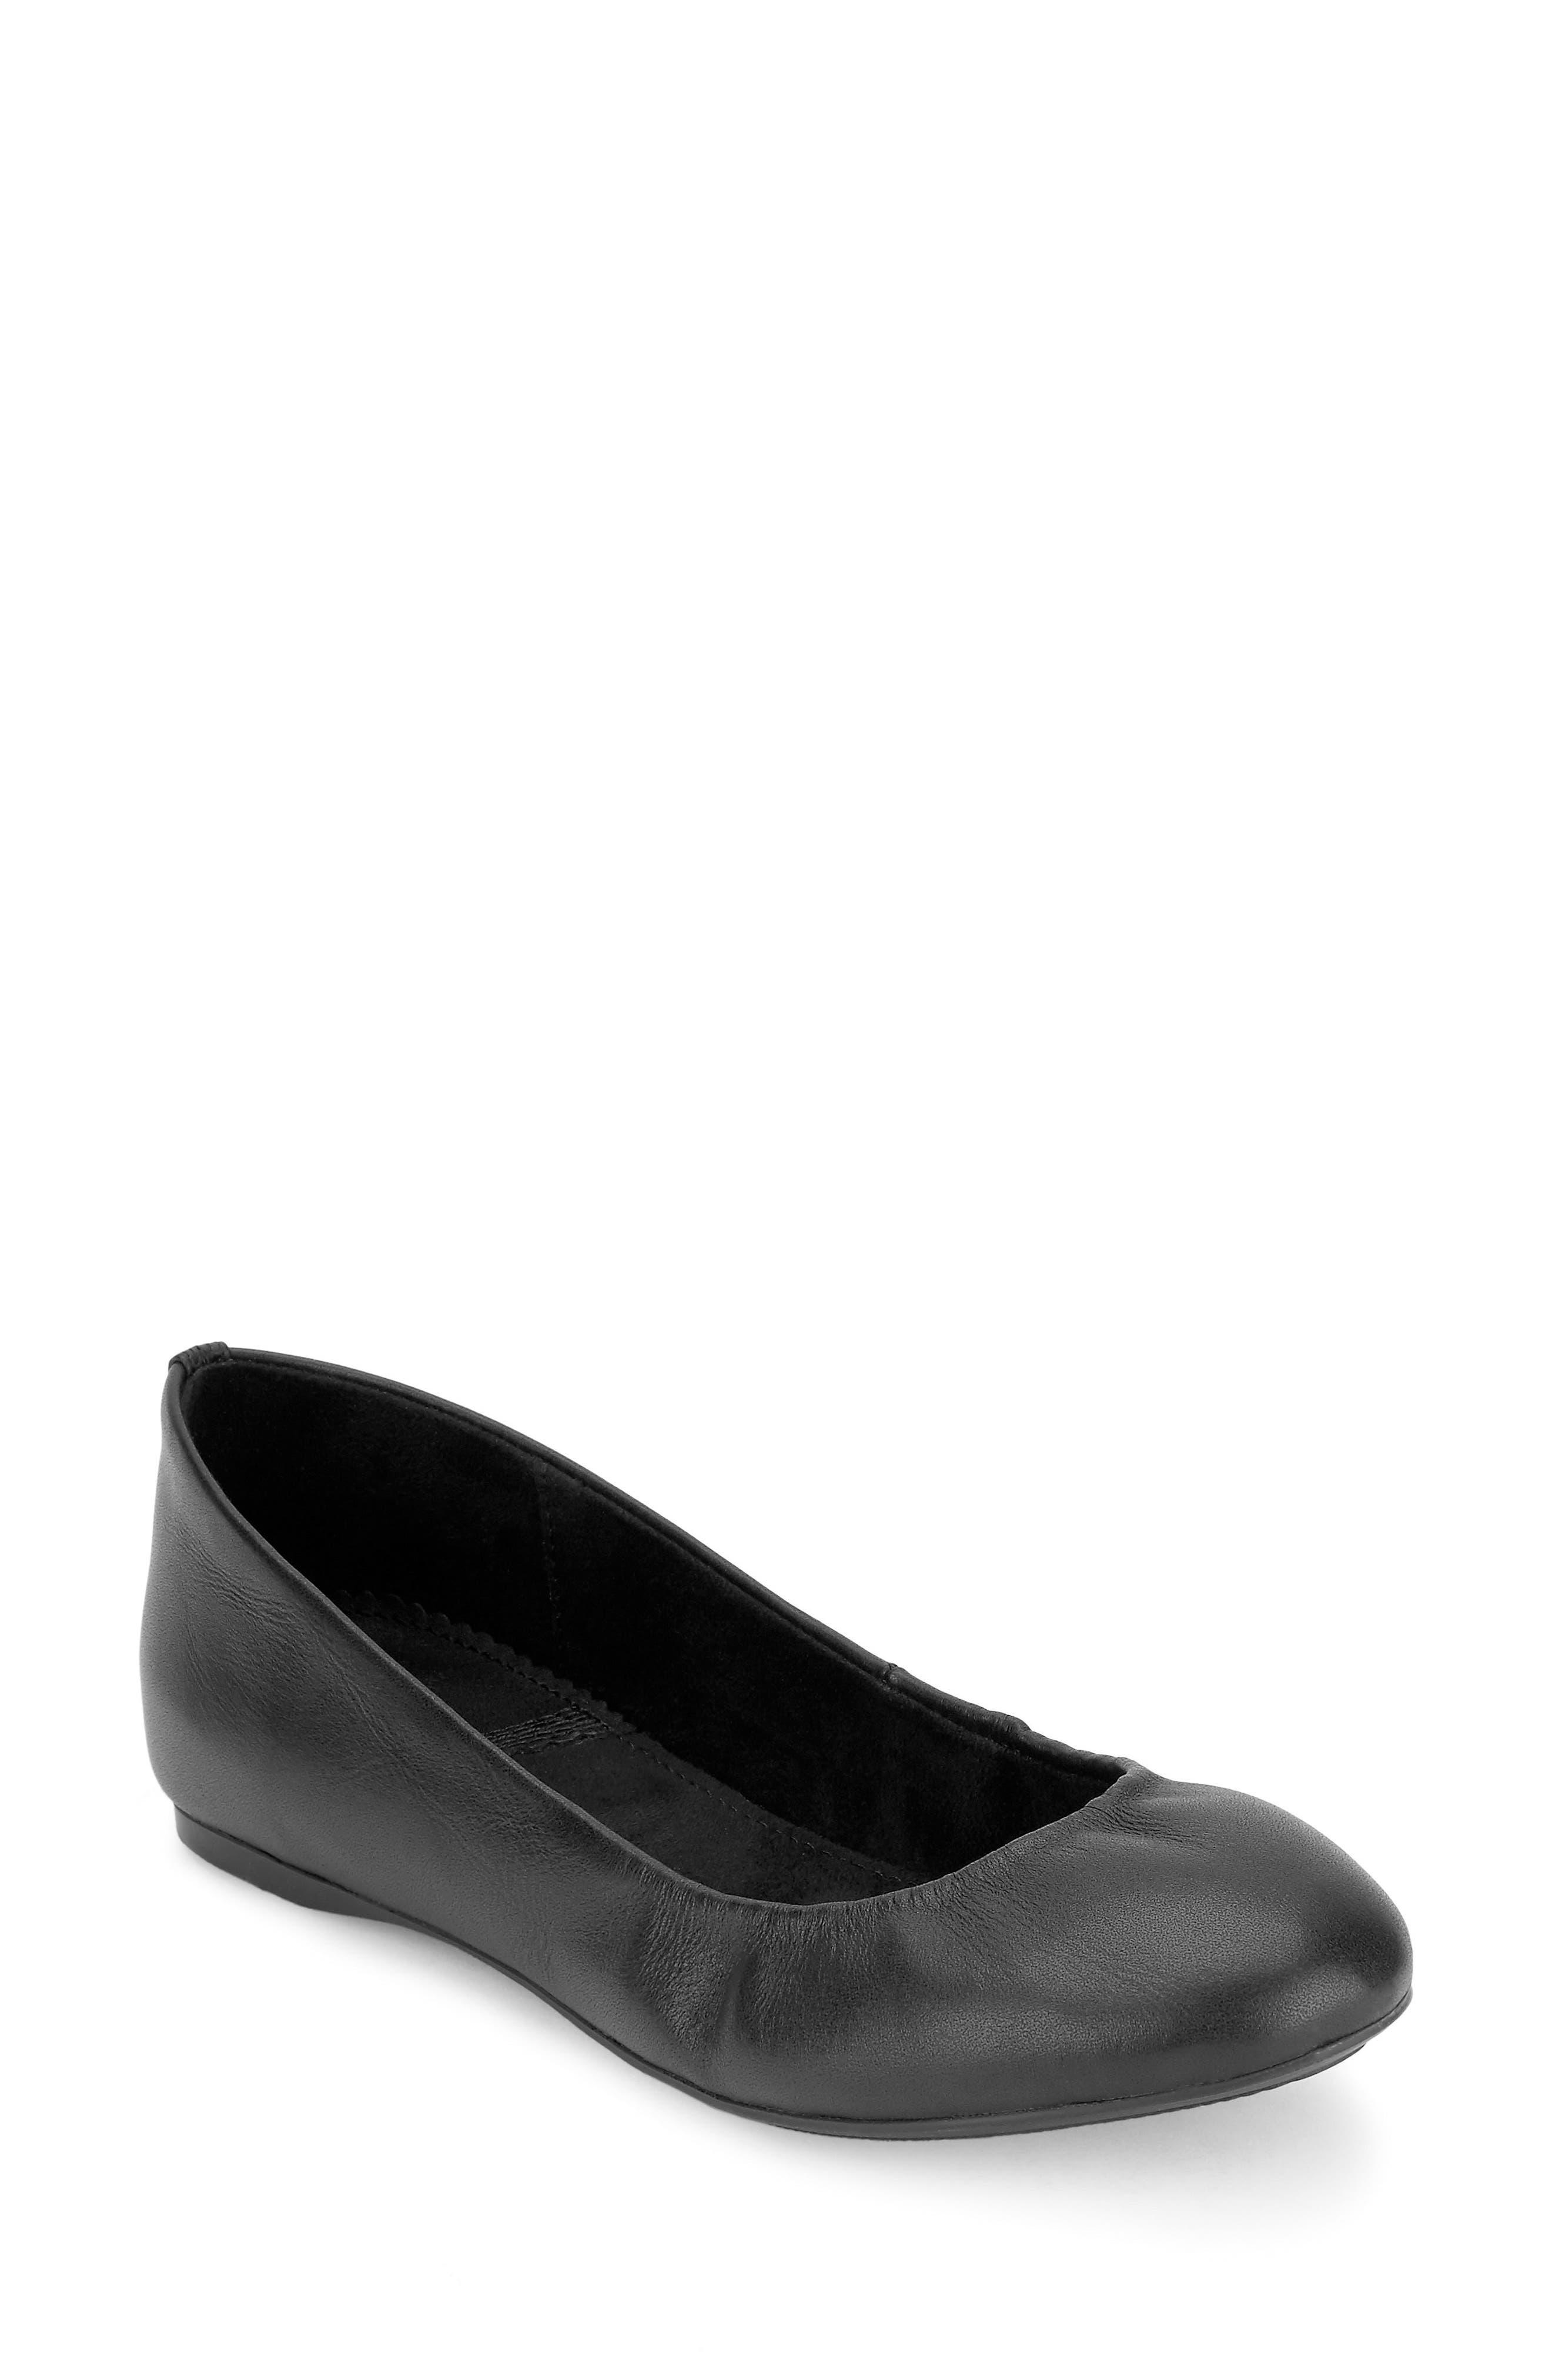 Felicity Ballet Flat,                             Main thumbnail 1, color,